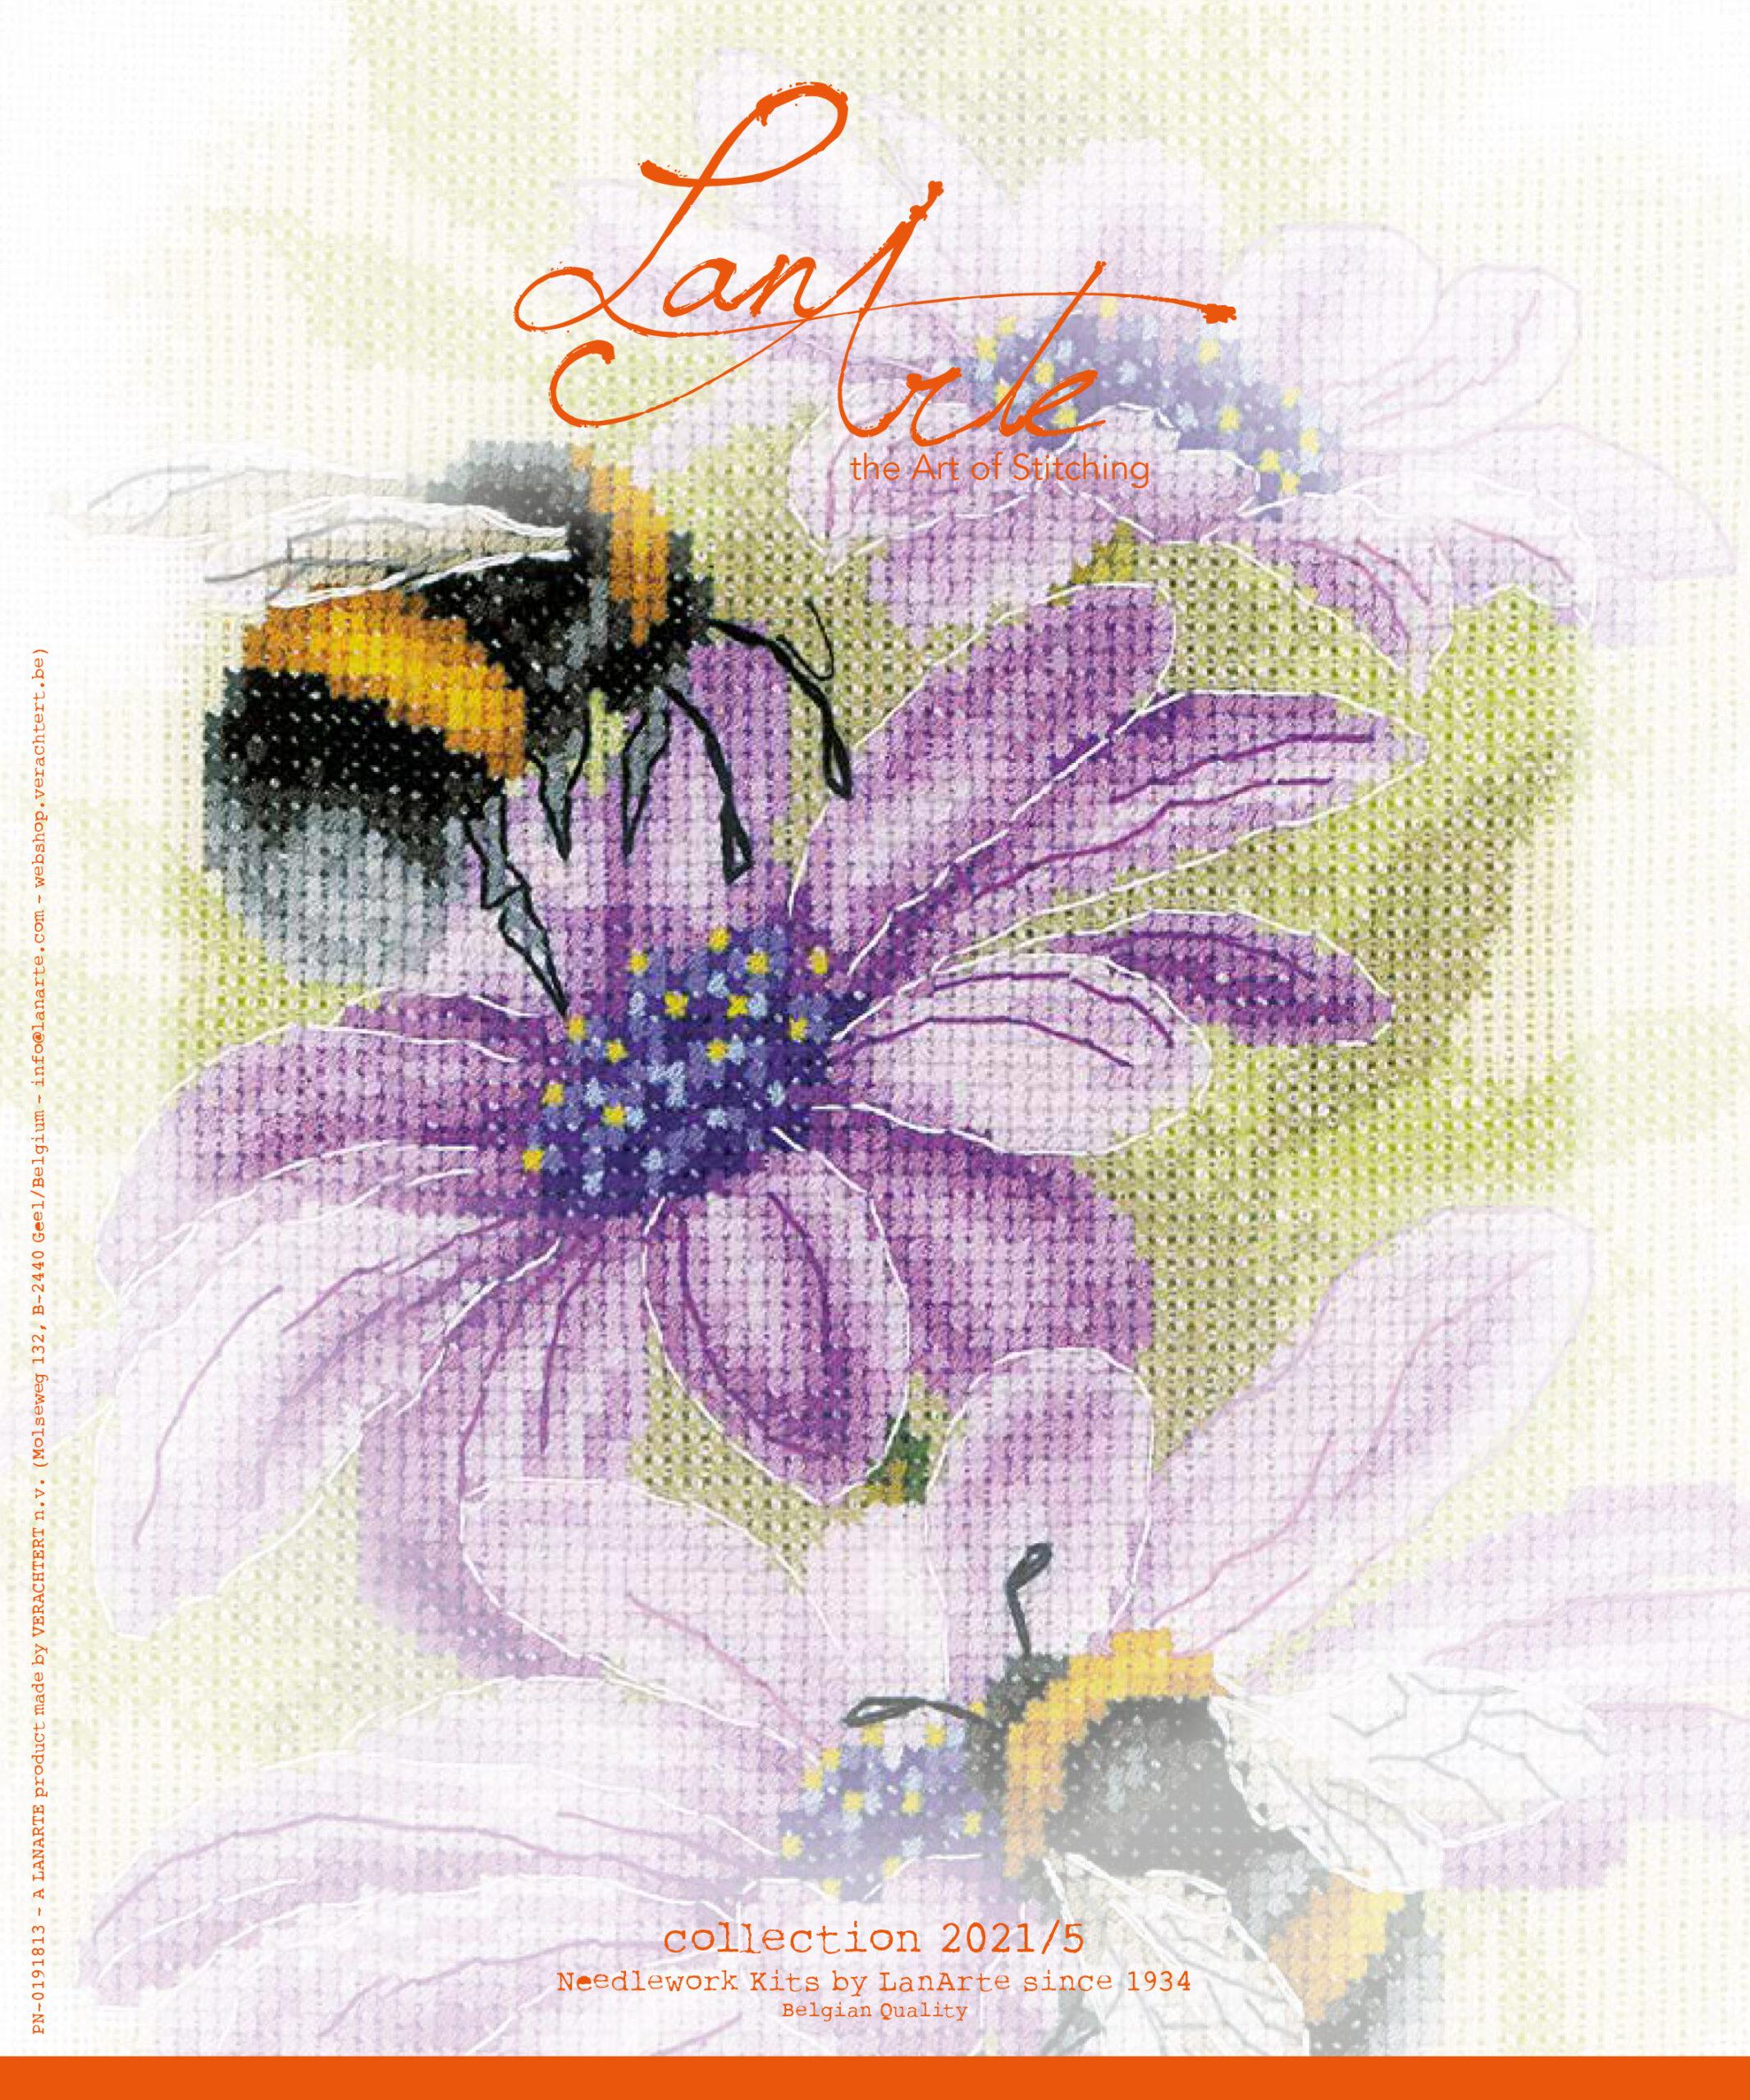 LanArte folder 2021/5 PN-0191813